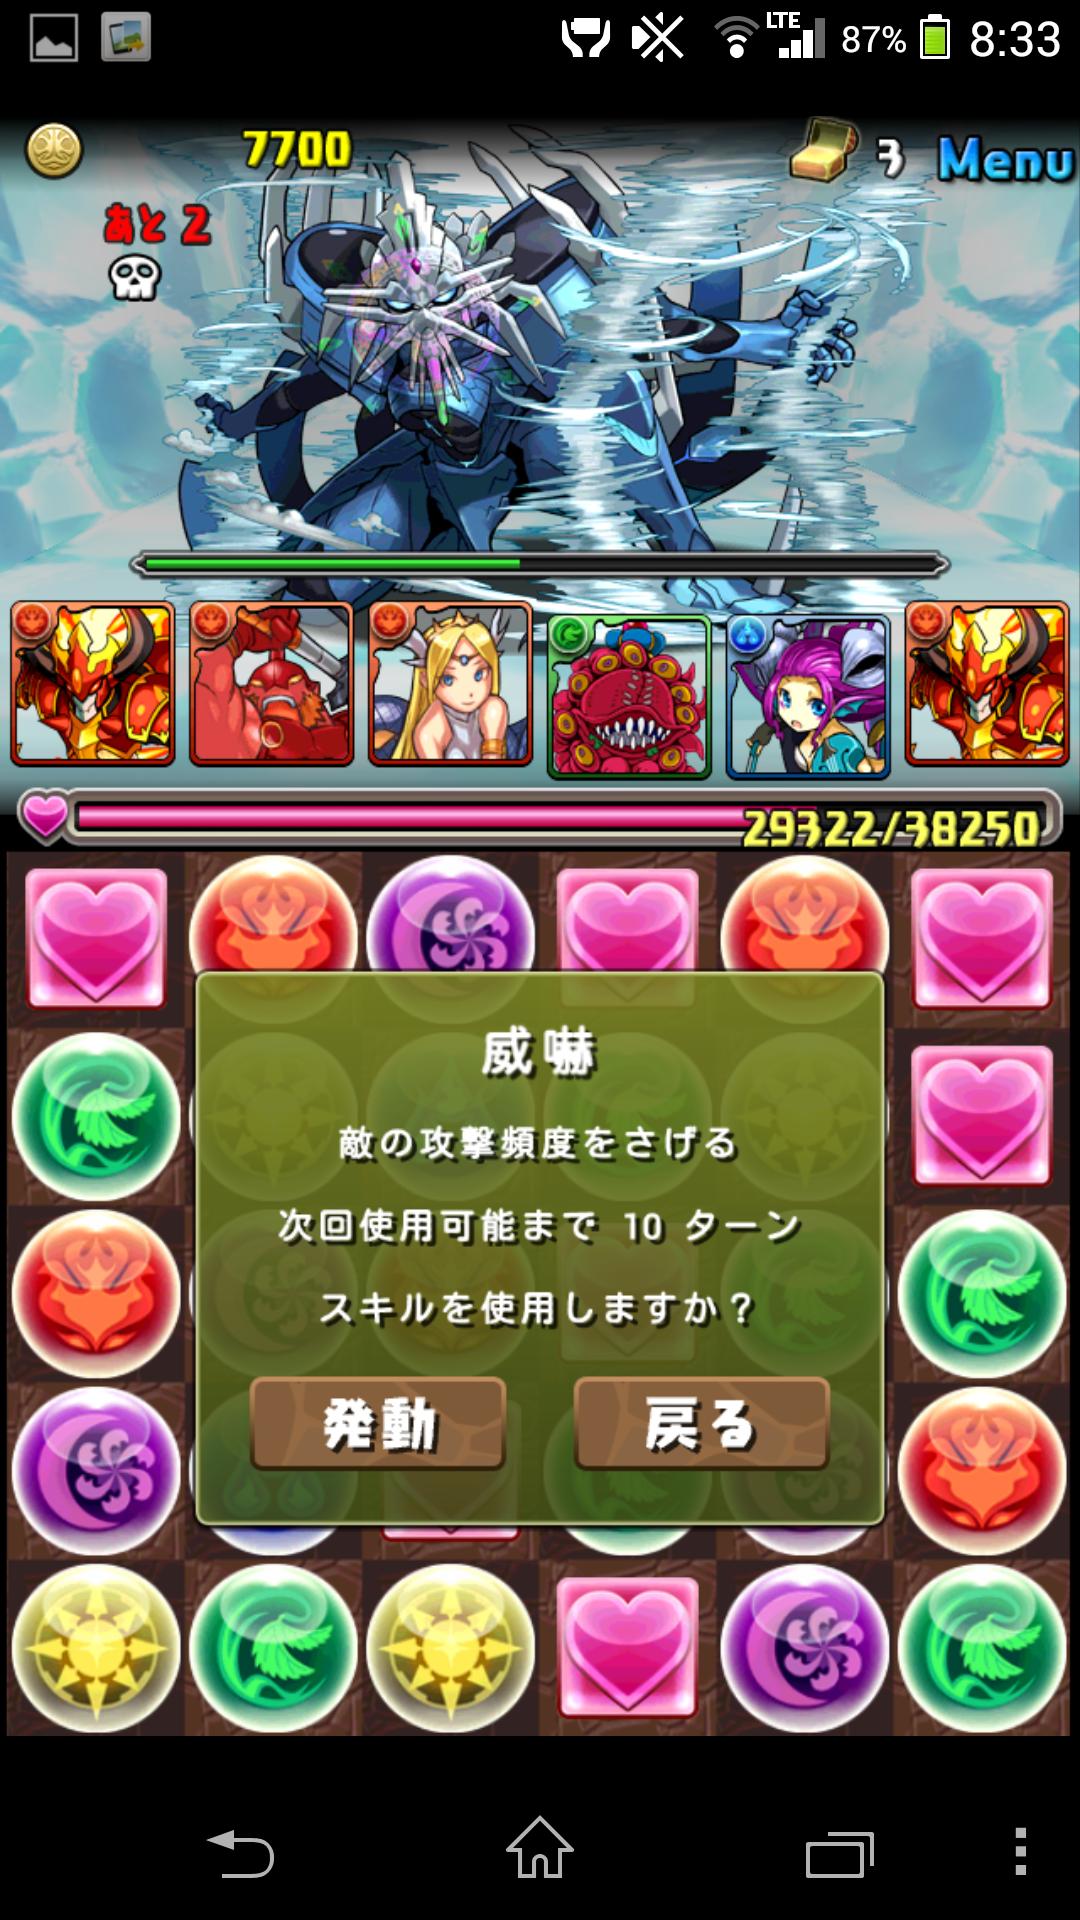 Screenshot_2014-04-04-08-33-43.png